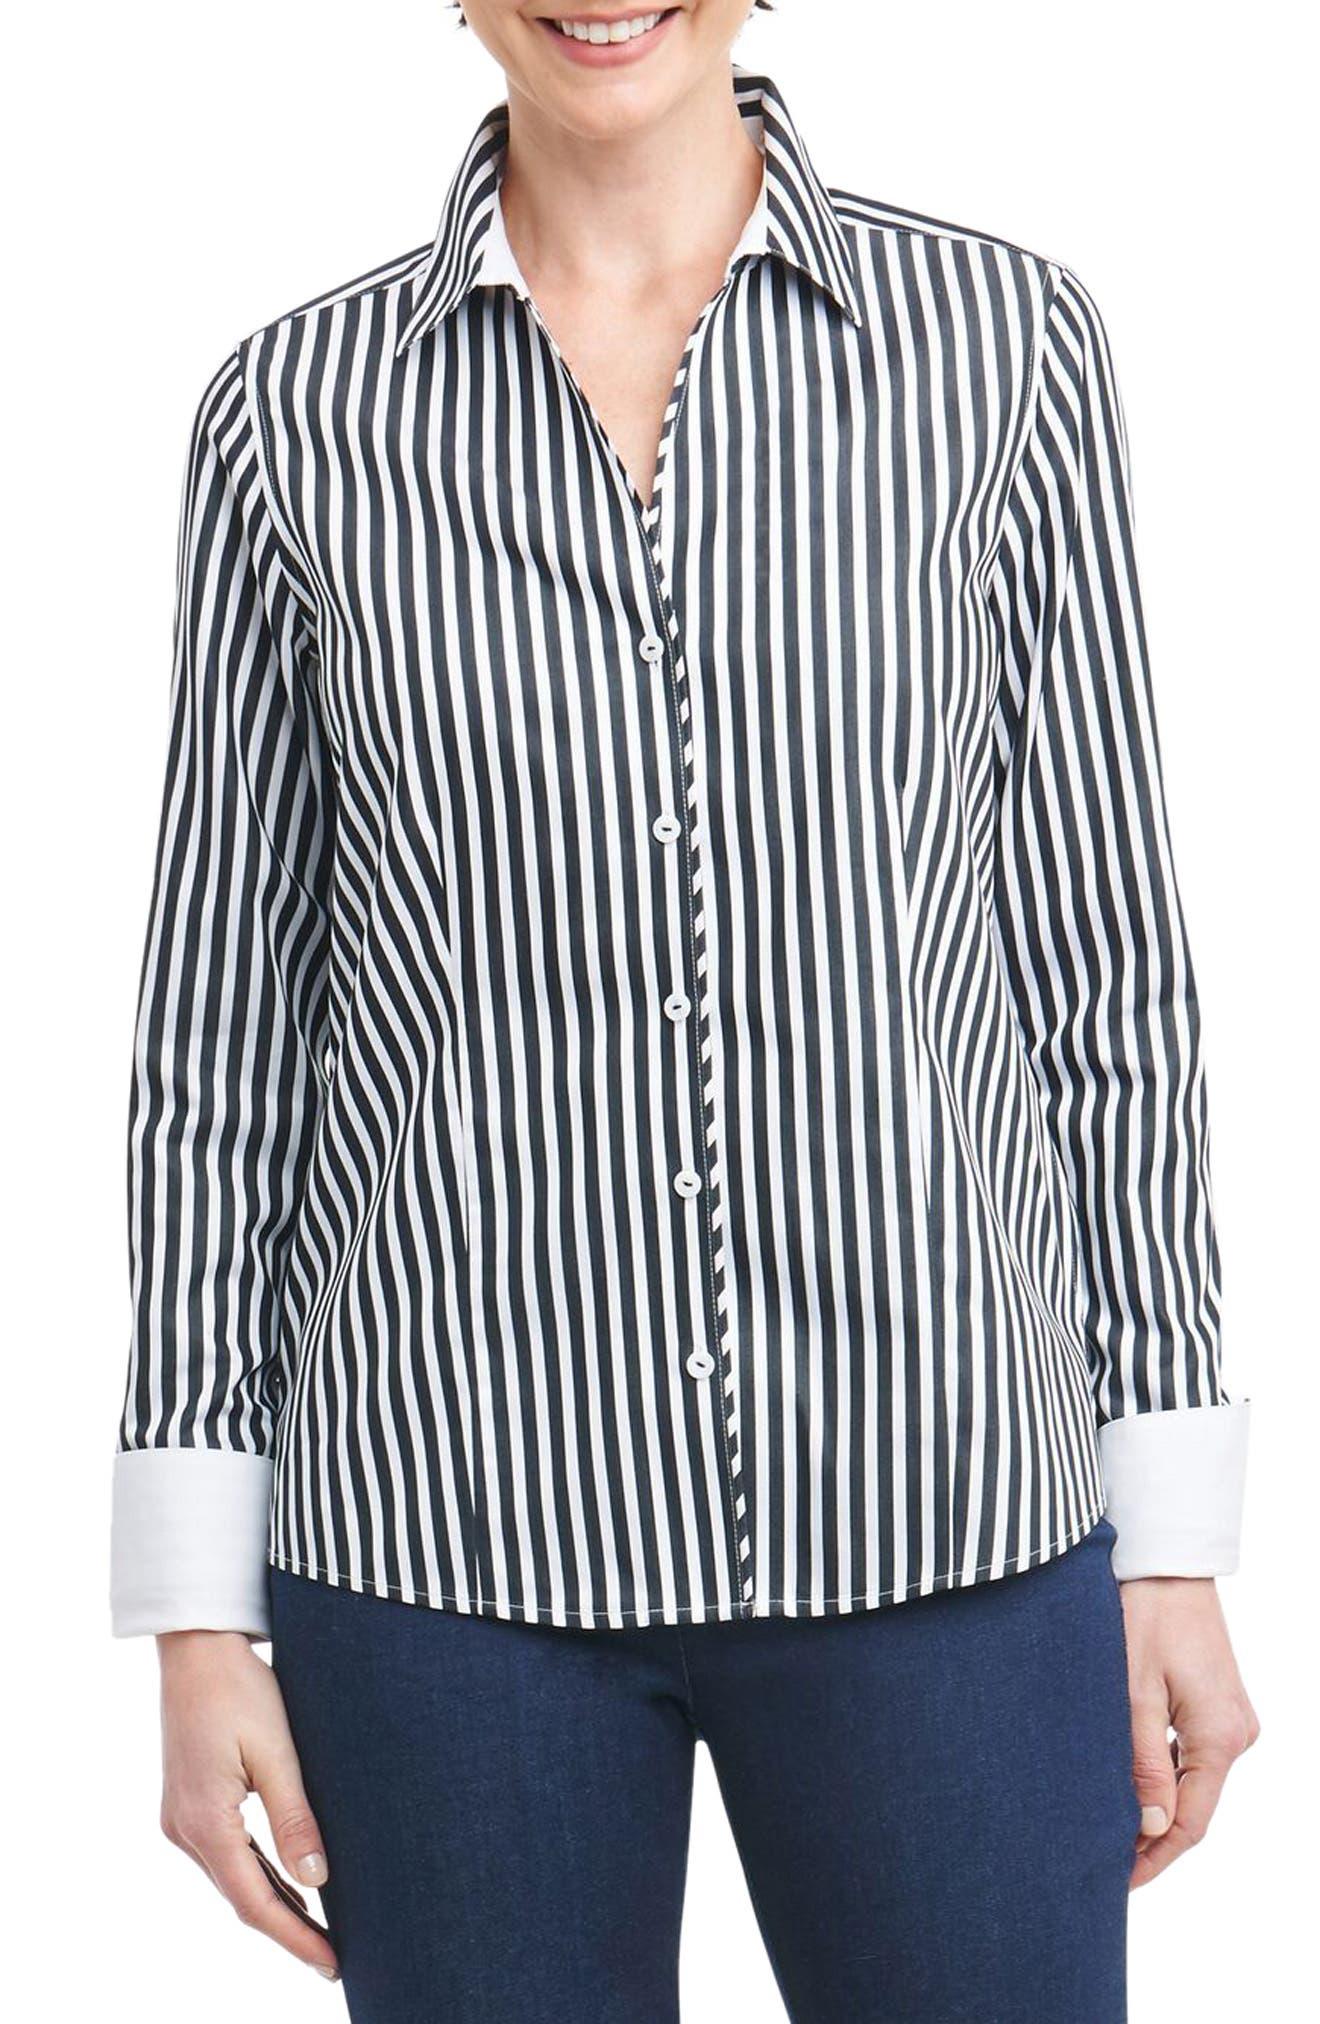 Lauren Sateen Stripe Shirt,                             Main thumbnail 1, color,